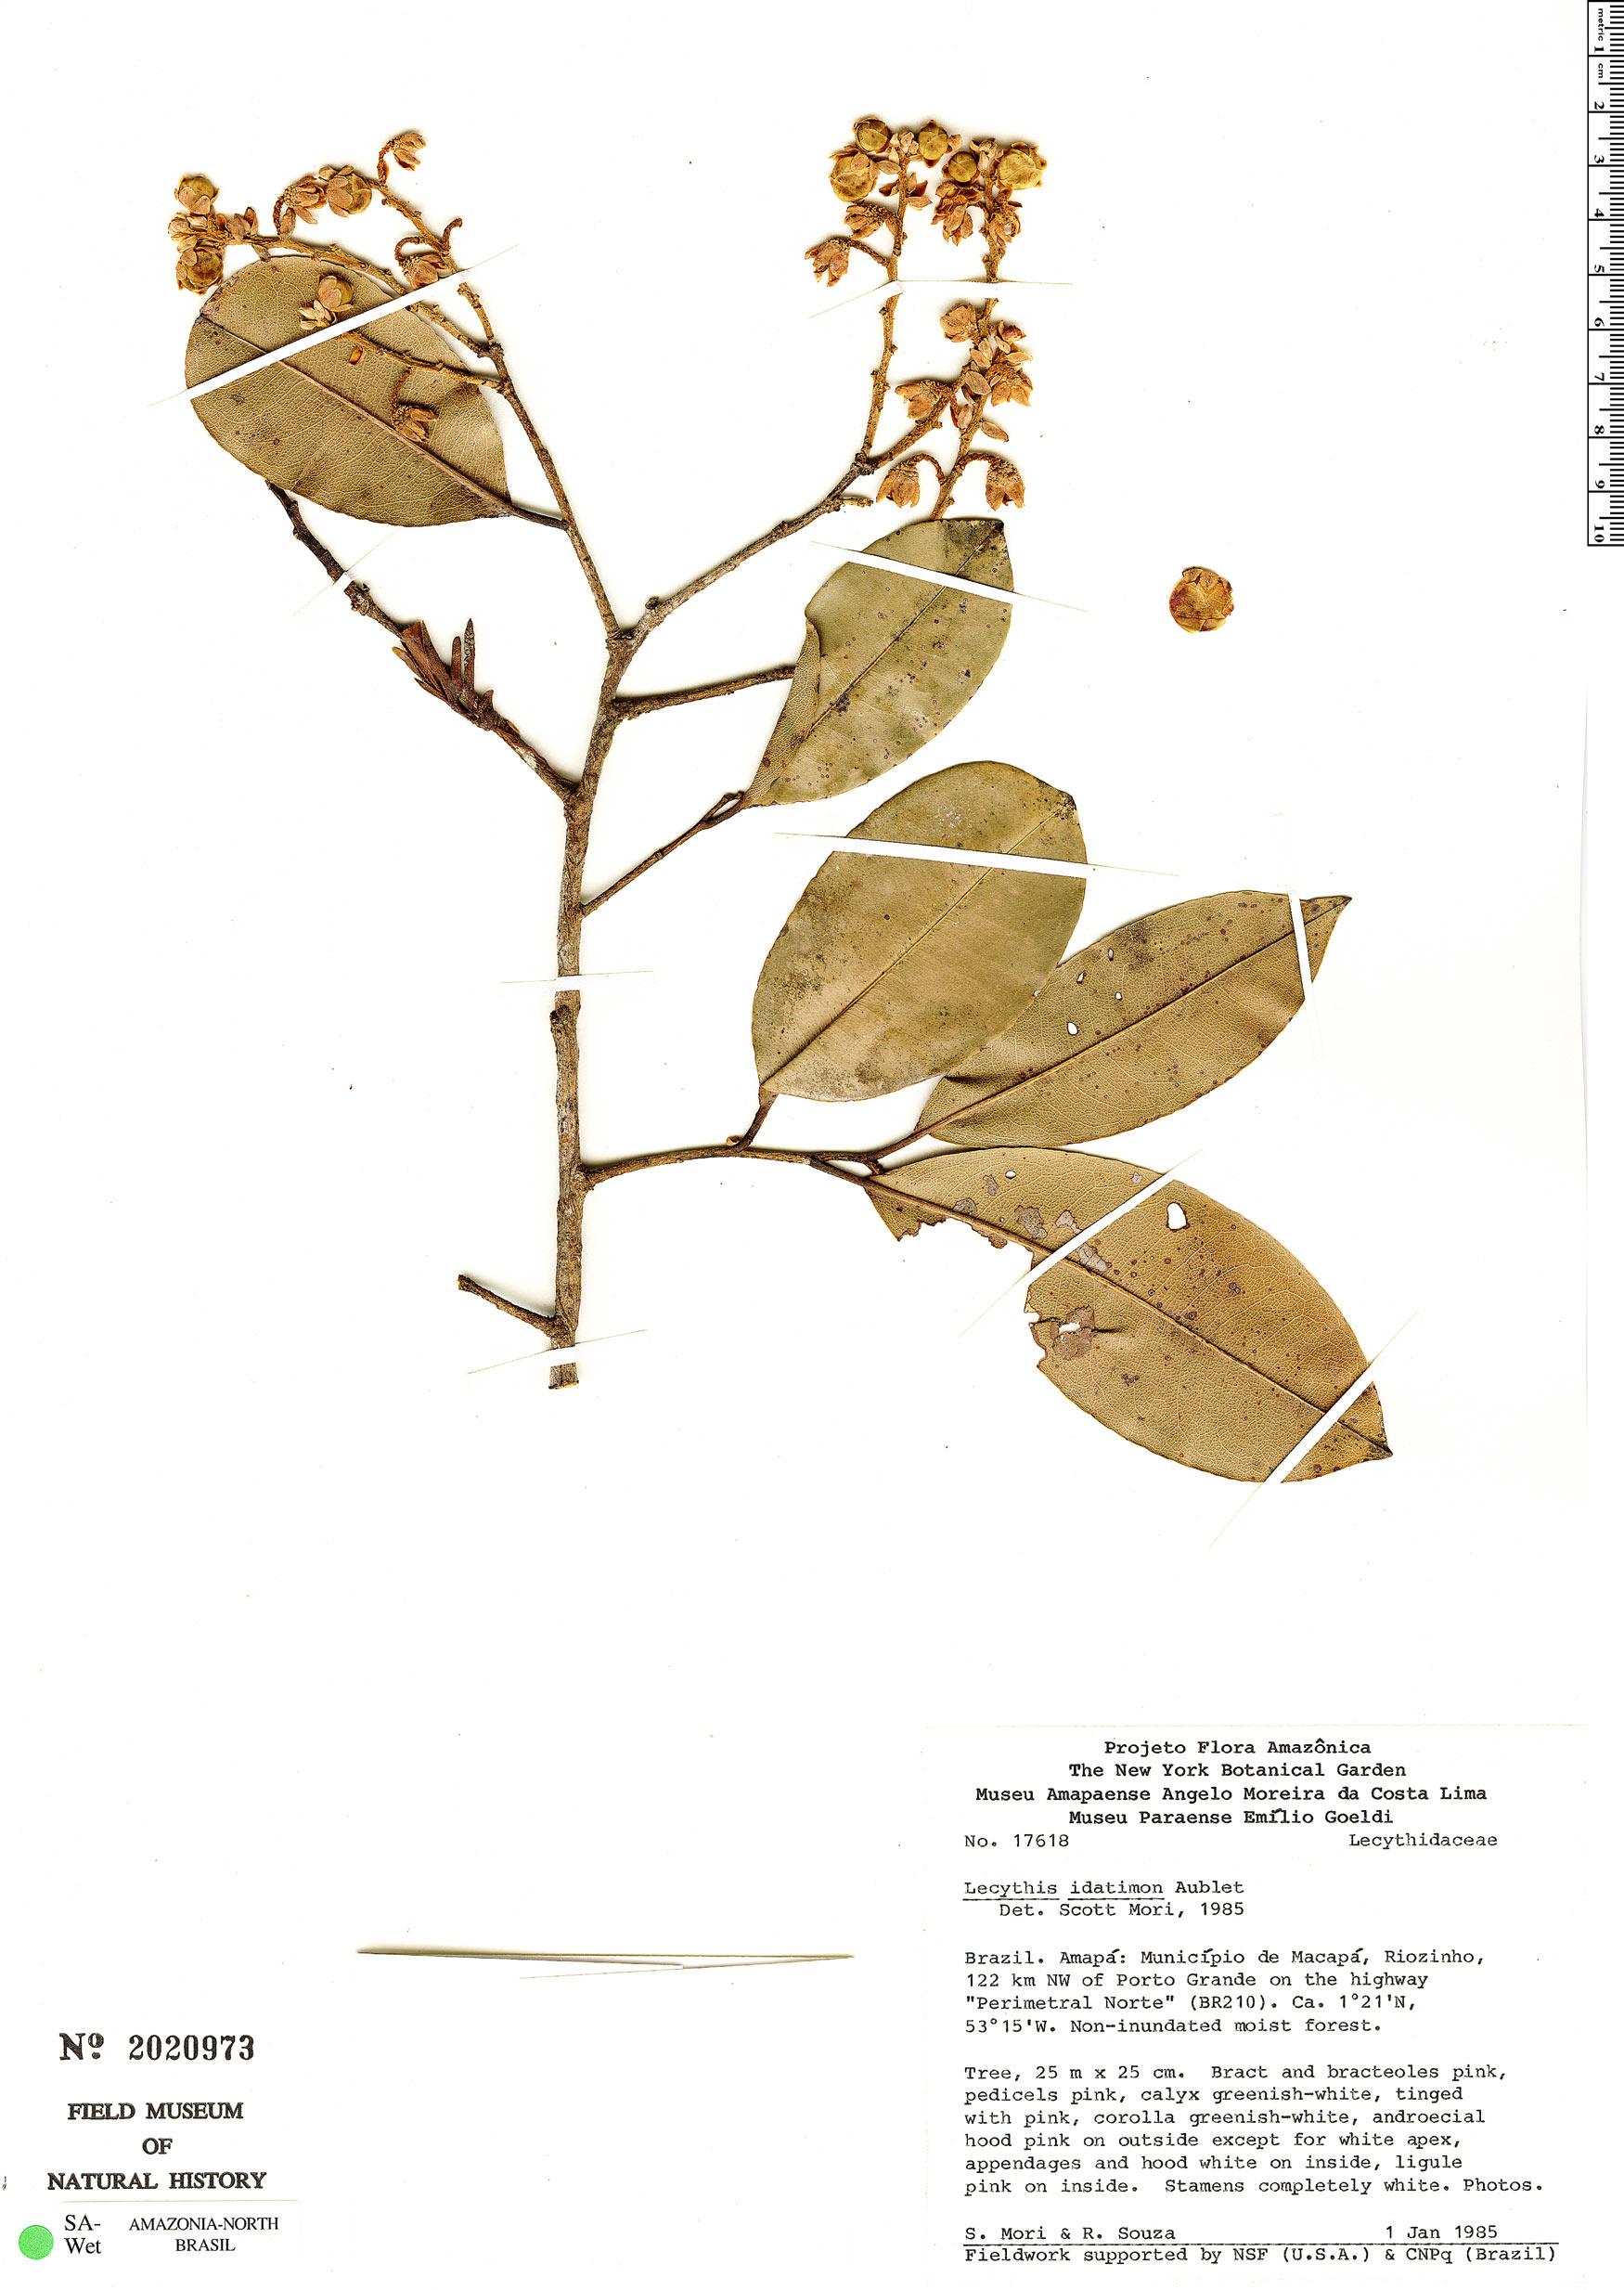 Specimen: Lecythis idatimon